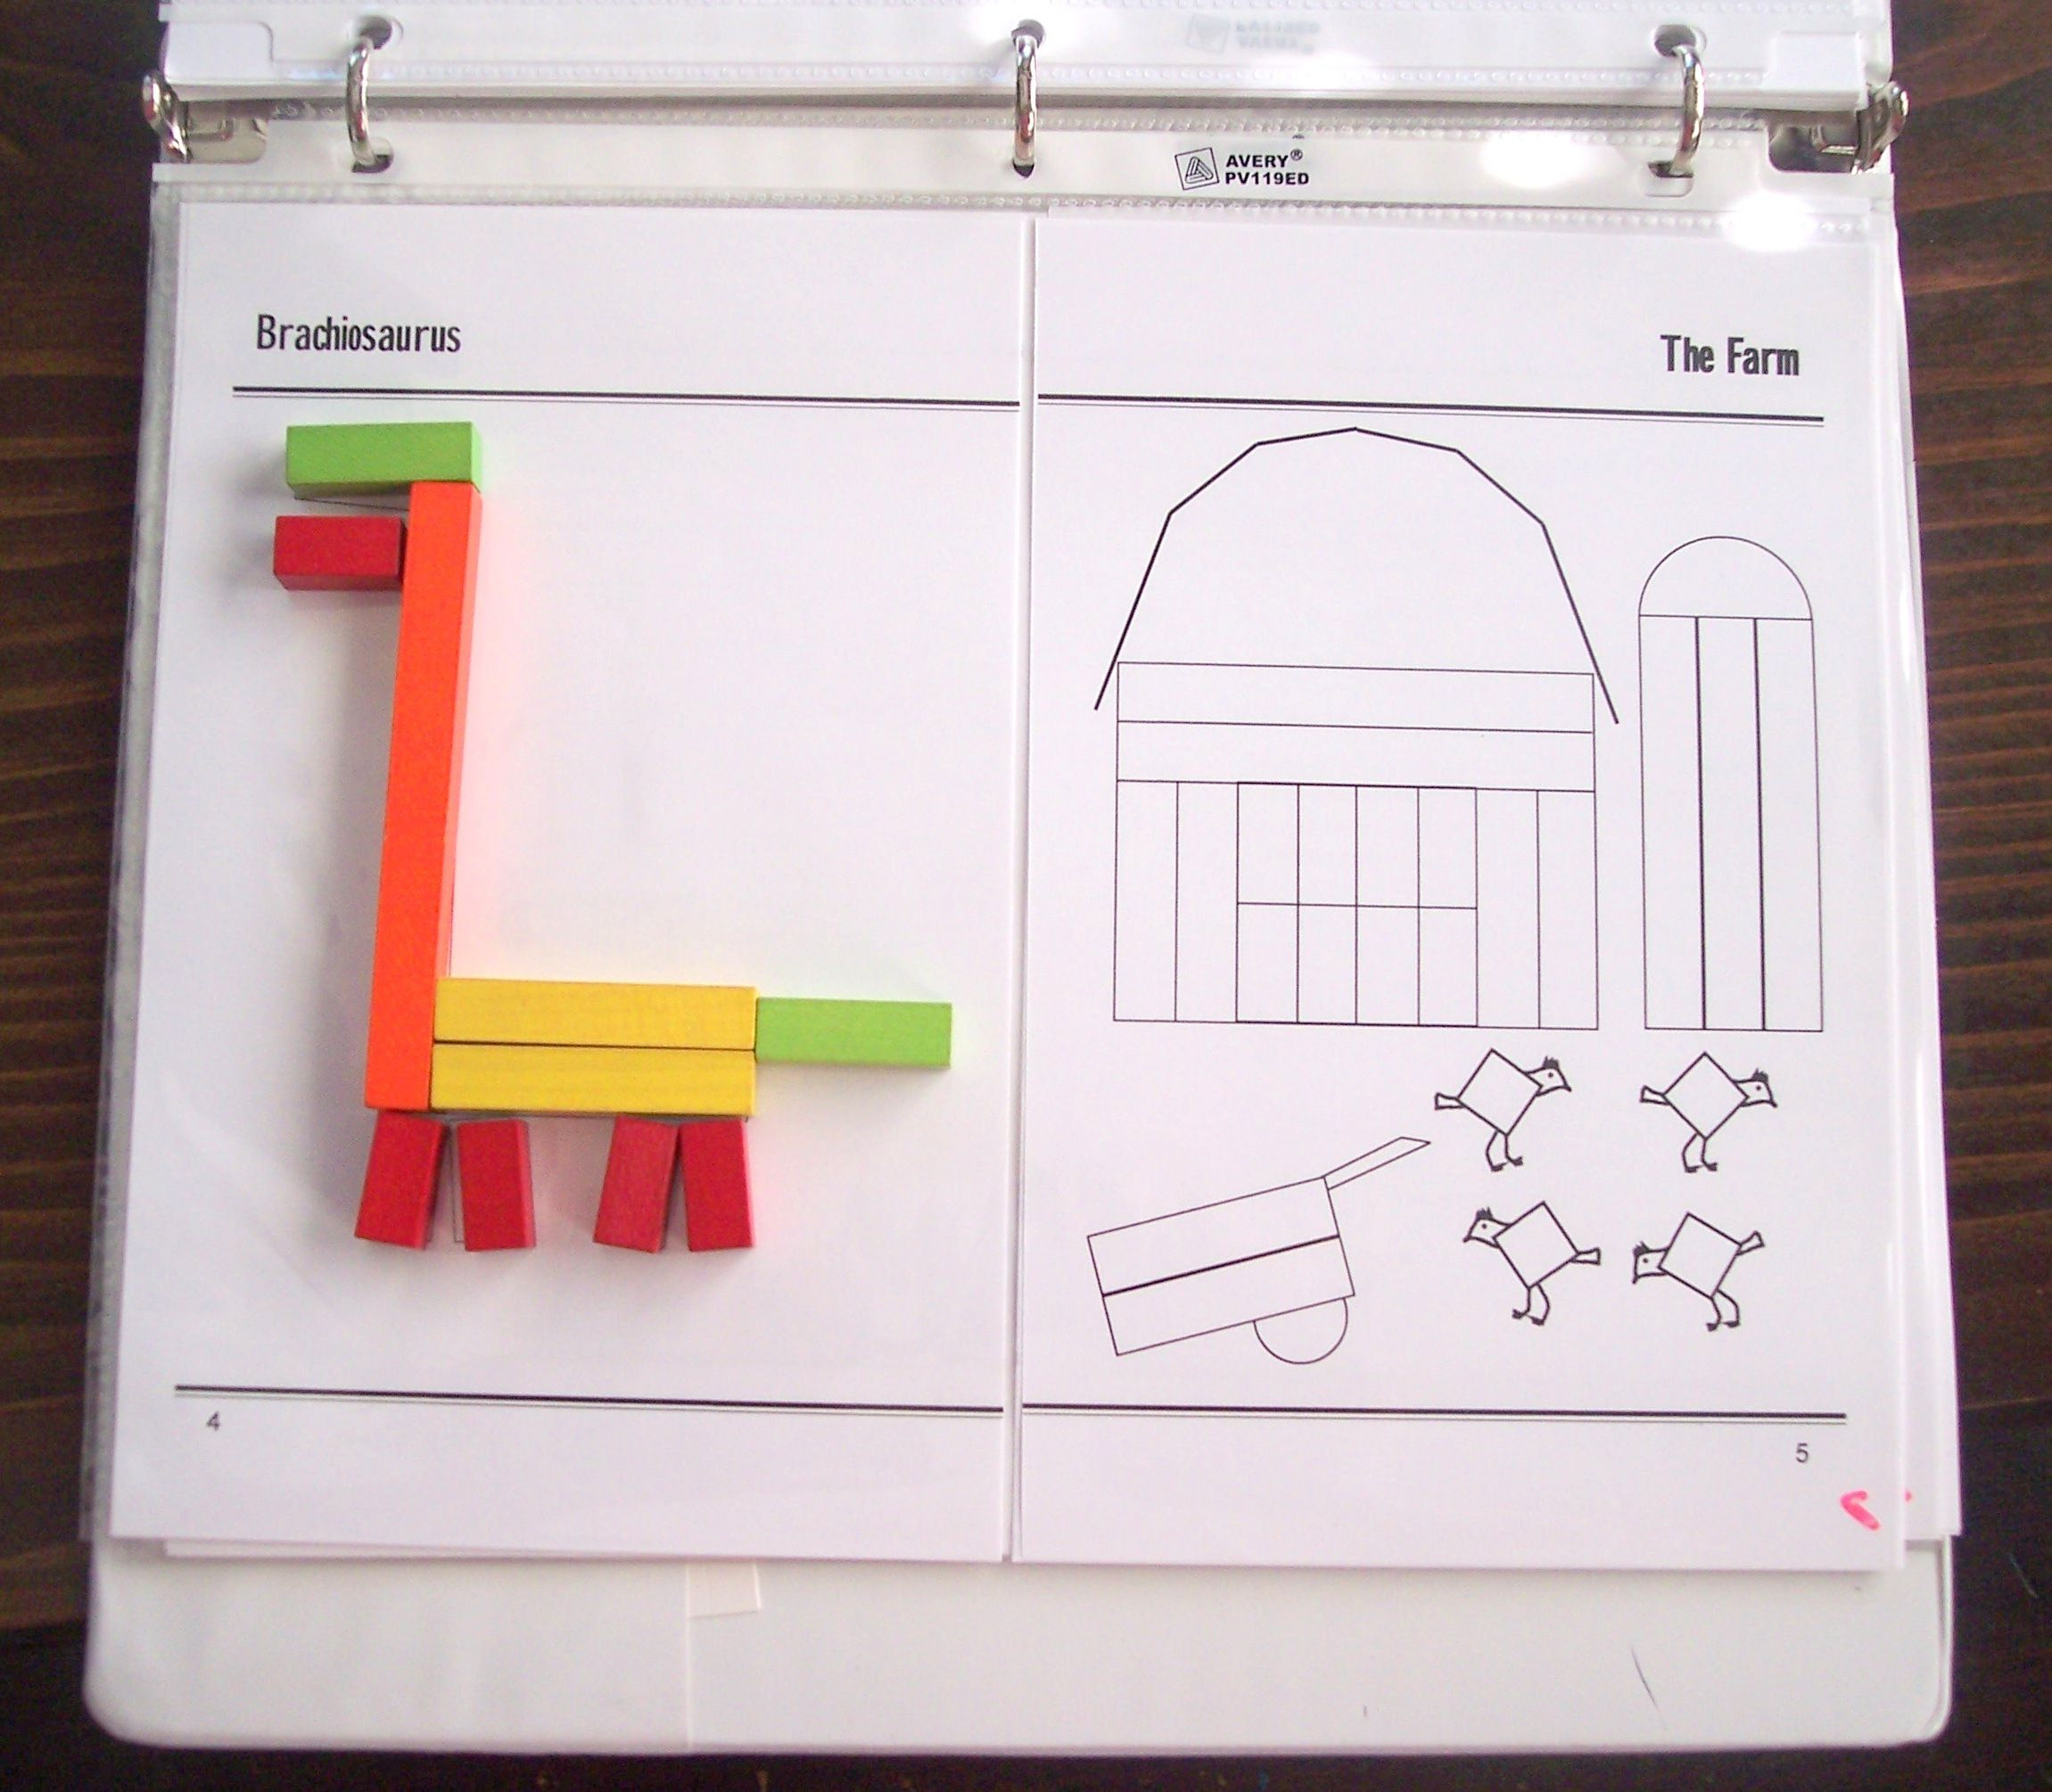 worksheet Cuisenaire Rods Worksheets extra kindergarten preschool miquon math activities with cuisenaire rods